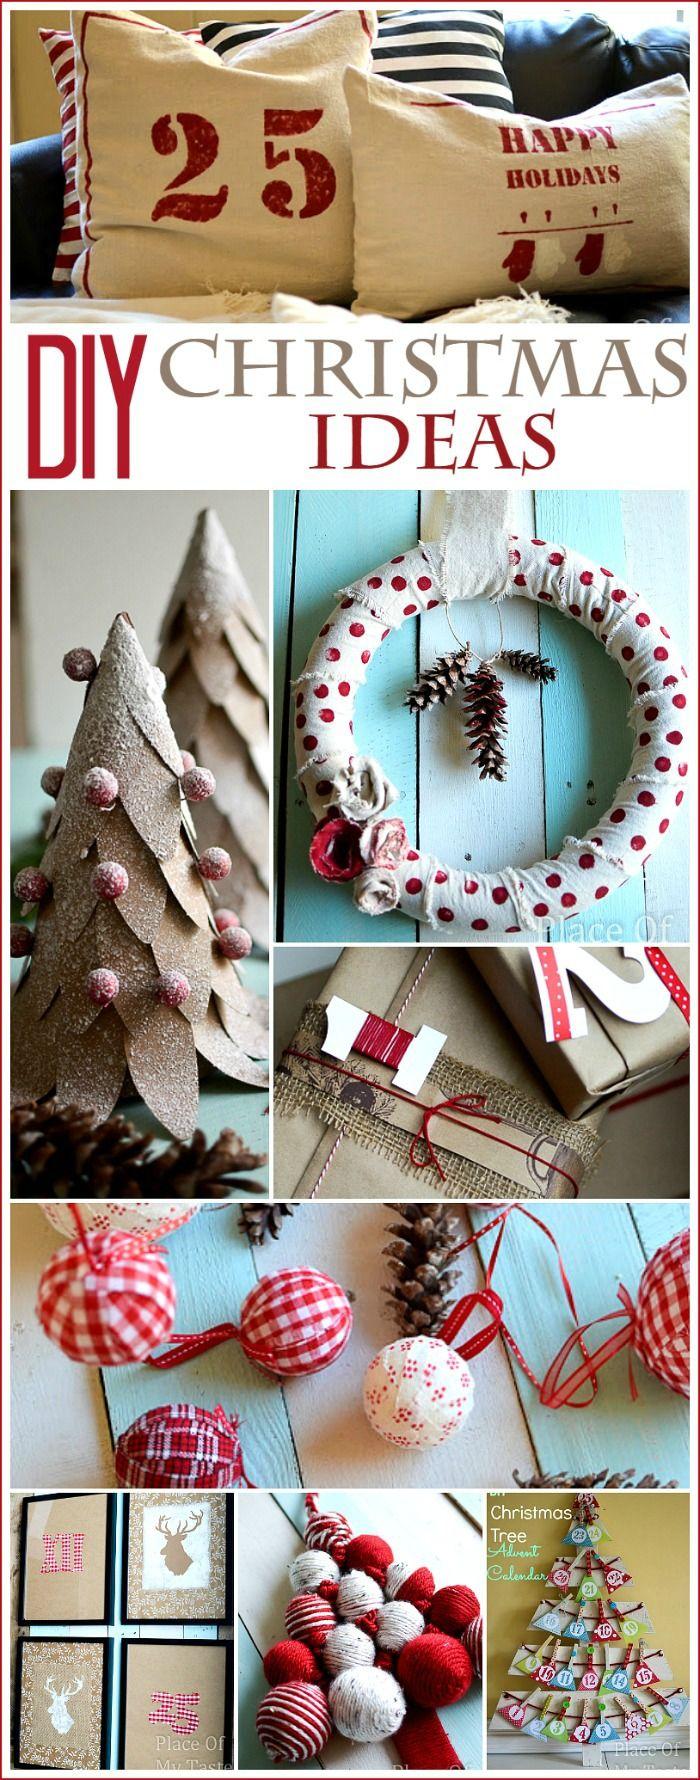 DIY CHRISTMAS IDEAS - Placeofmytaste.com